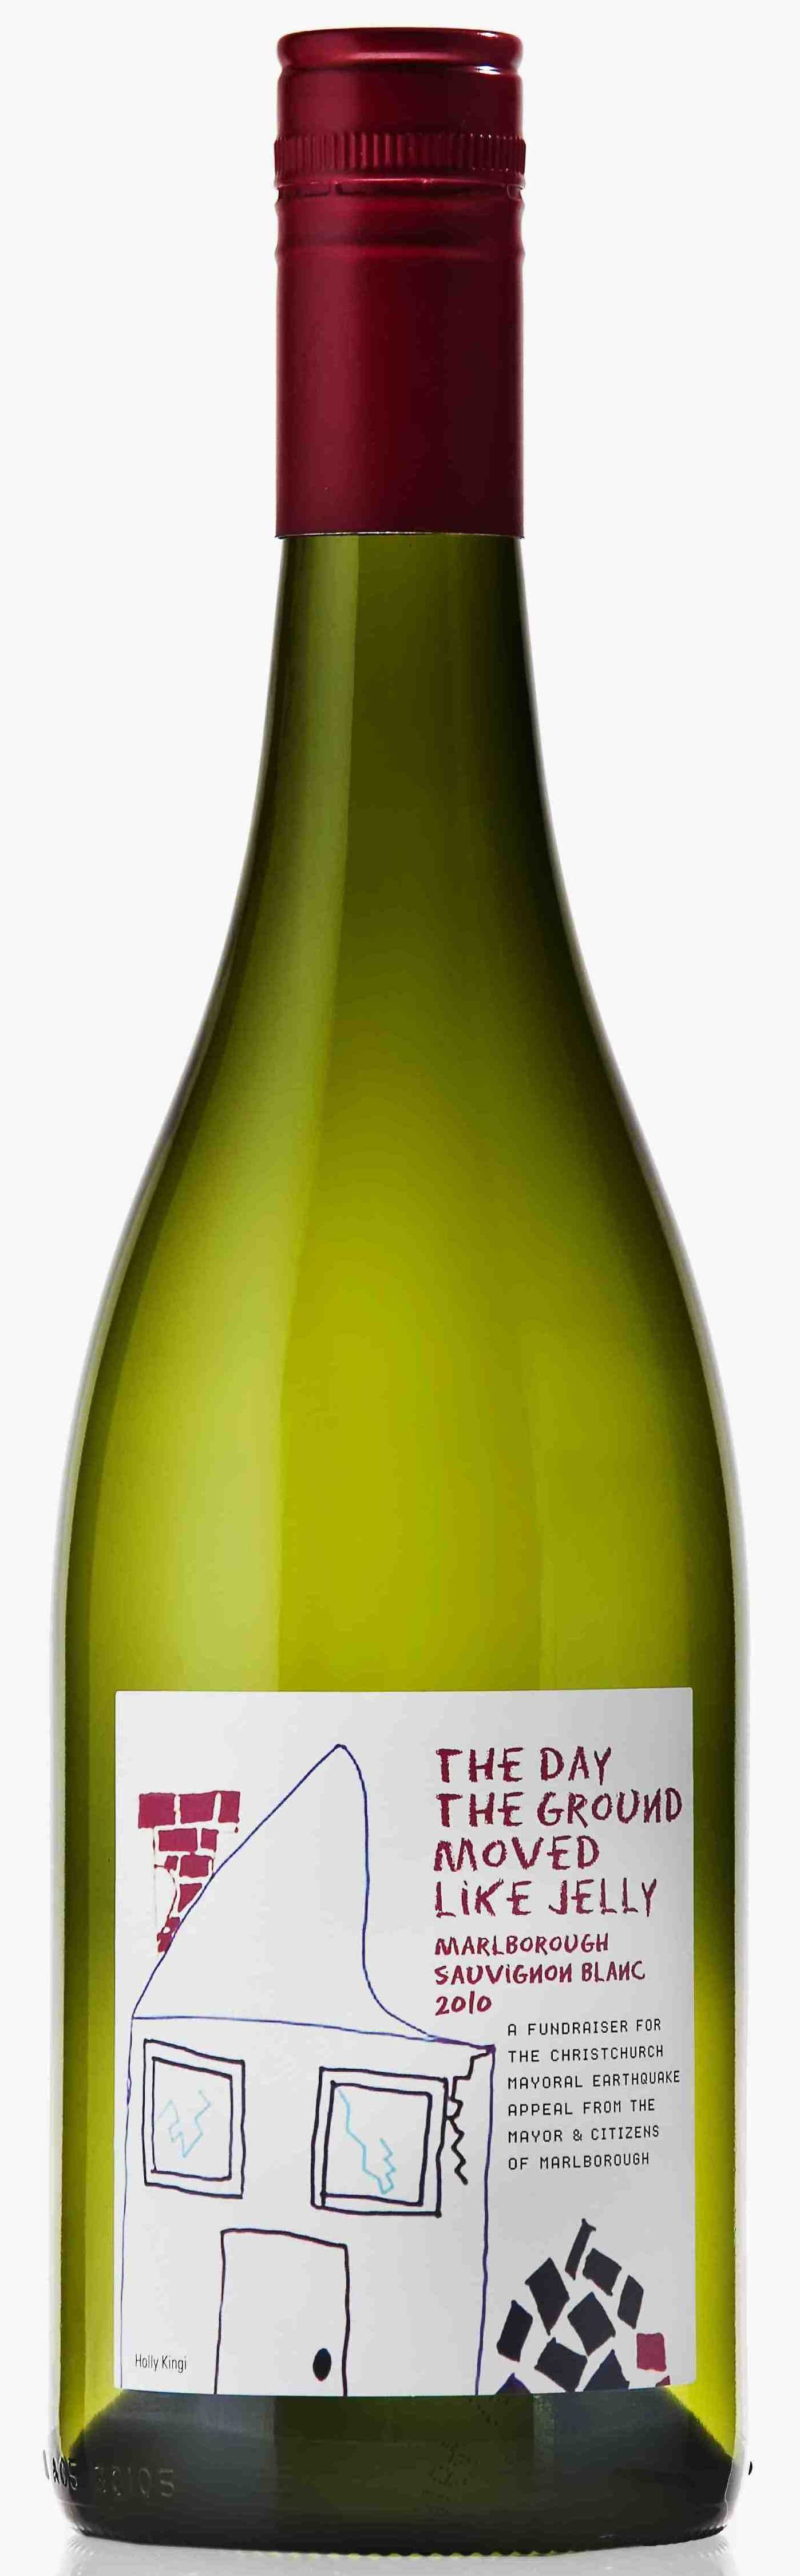 Mud house wines release earthquake blend fresh ideas